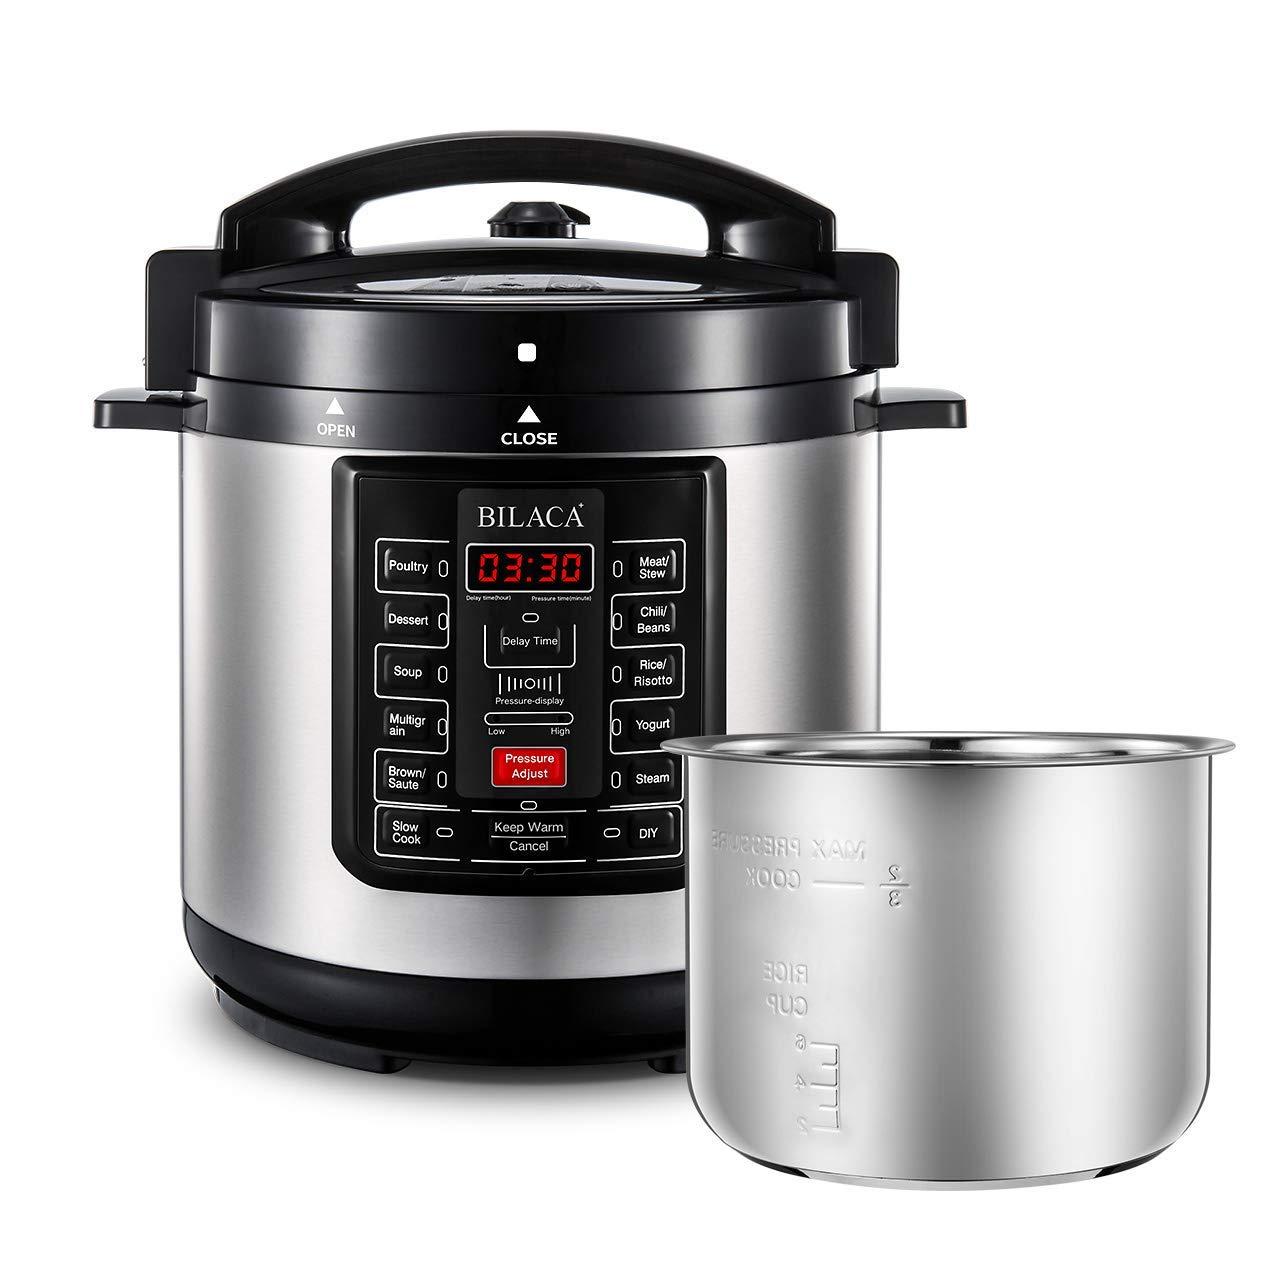 Electric Pressure Cooker,BILACA 6 Qt 9-in-1 Multi Programmable Pressure Cooker,Slow Cooker,Rice Cooker,Steamer,Yogurt Maker,Saut and Warmer With Stainless Steel Inner Pot by BILACA